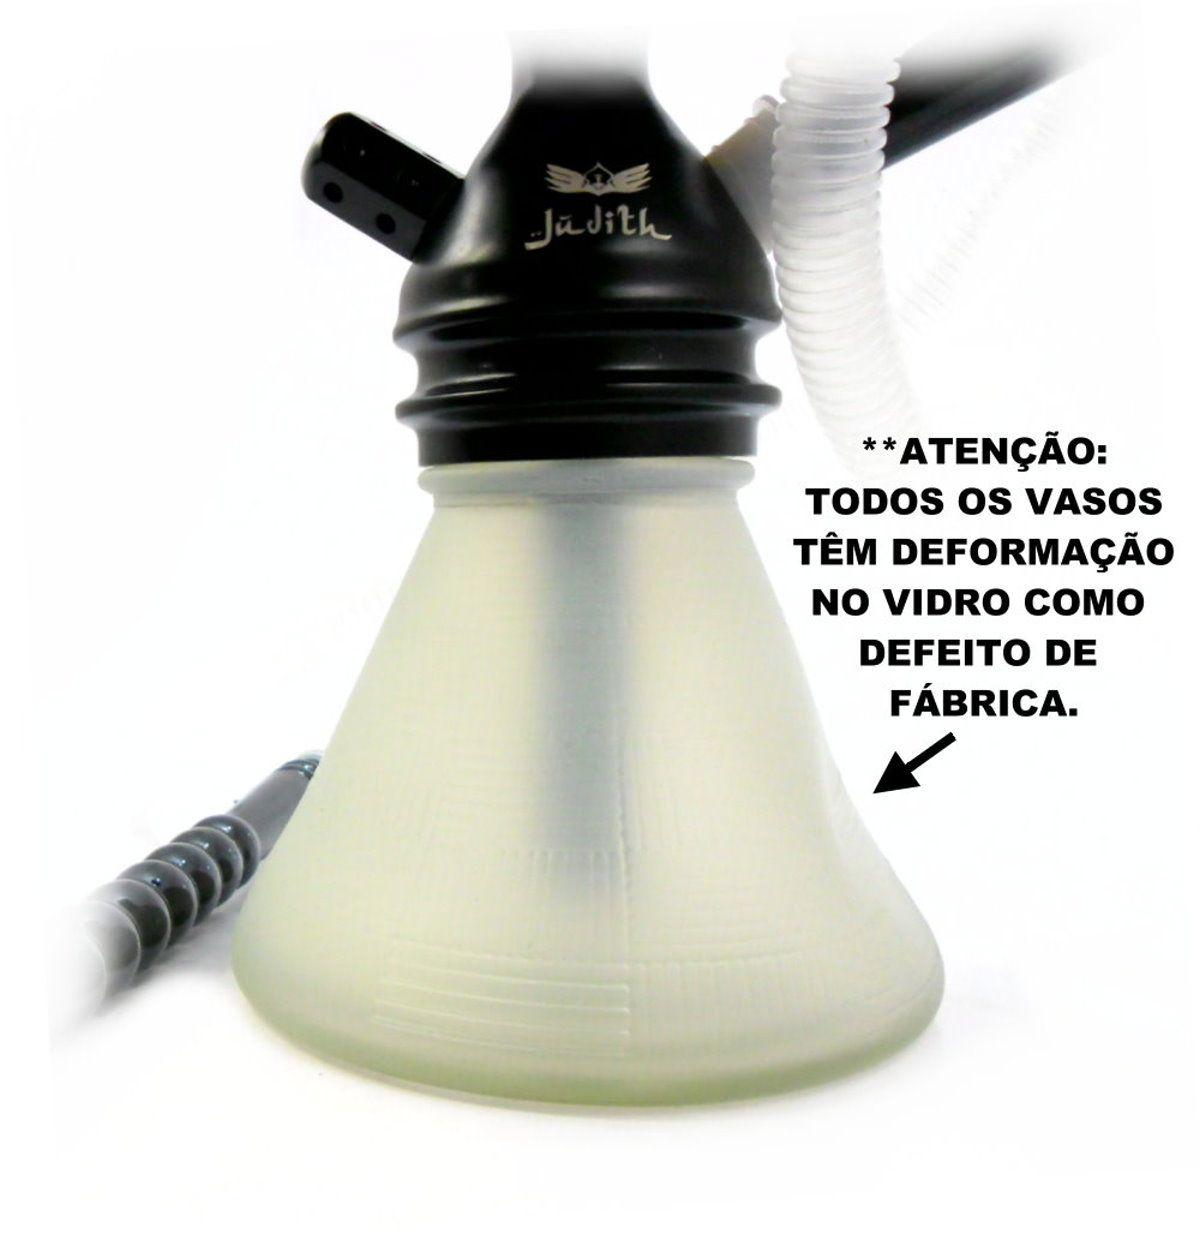 Narguile JUDITH PRETO LISO 33cm, vaso petit BRANCO, mangueira MD BLACK fornilho Flux Bowl Preto, prato VENNUS PRETO/CROM